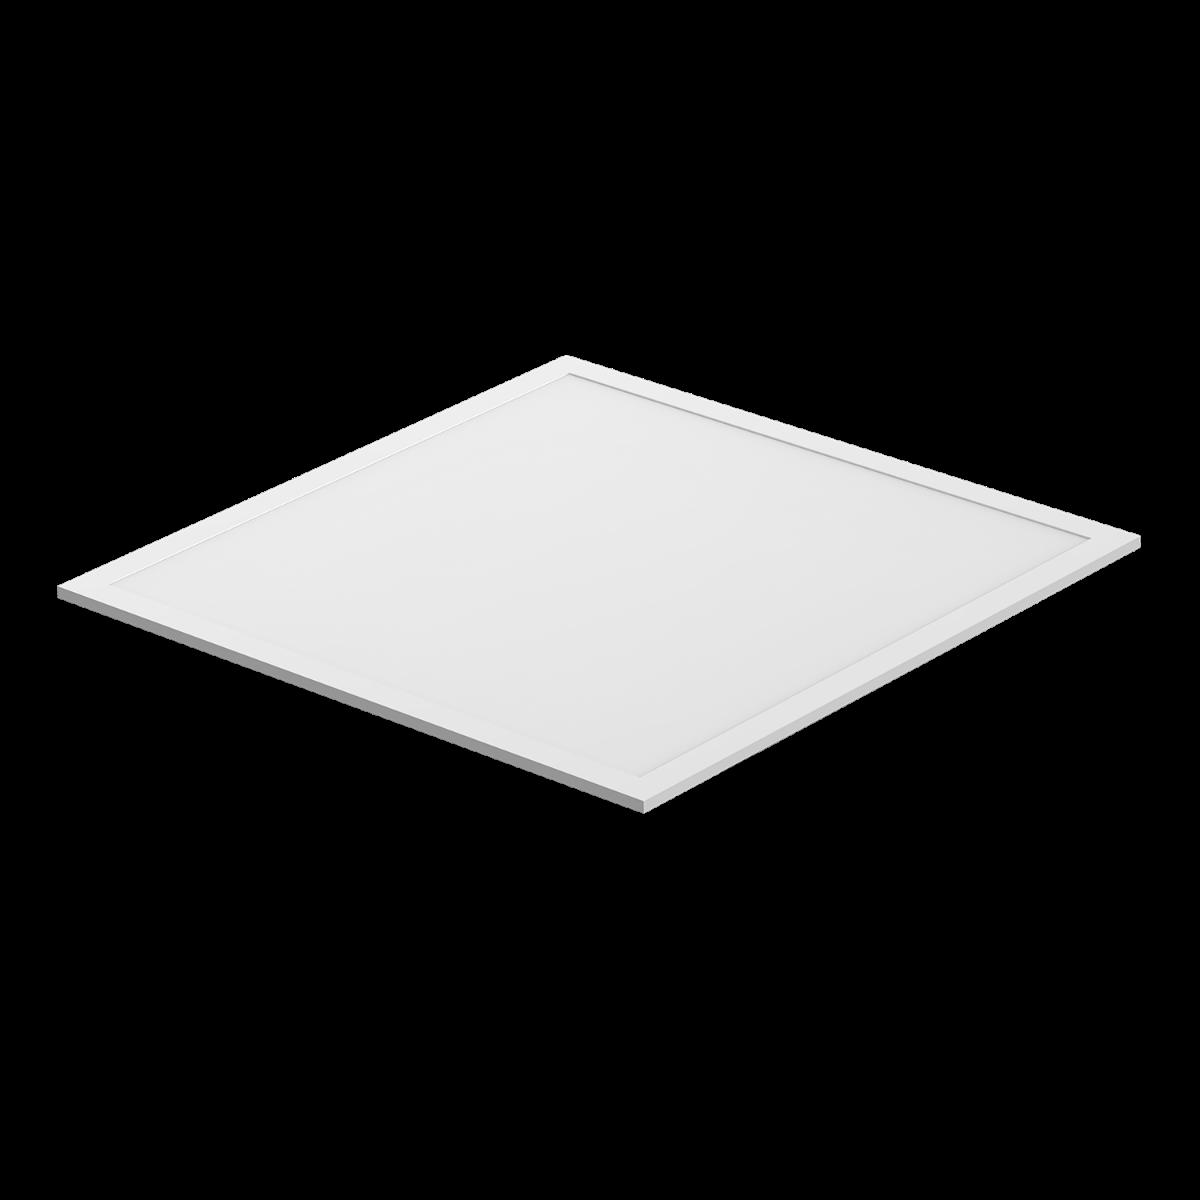 Noxion LED Panel Econox 32W Xitanium DALI 60x60cm 6500K 4400lm UGR <22 | Dali Dimmable - Replacer for 4x18W